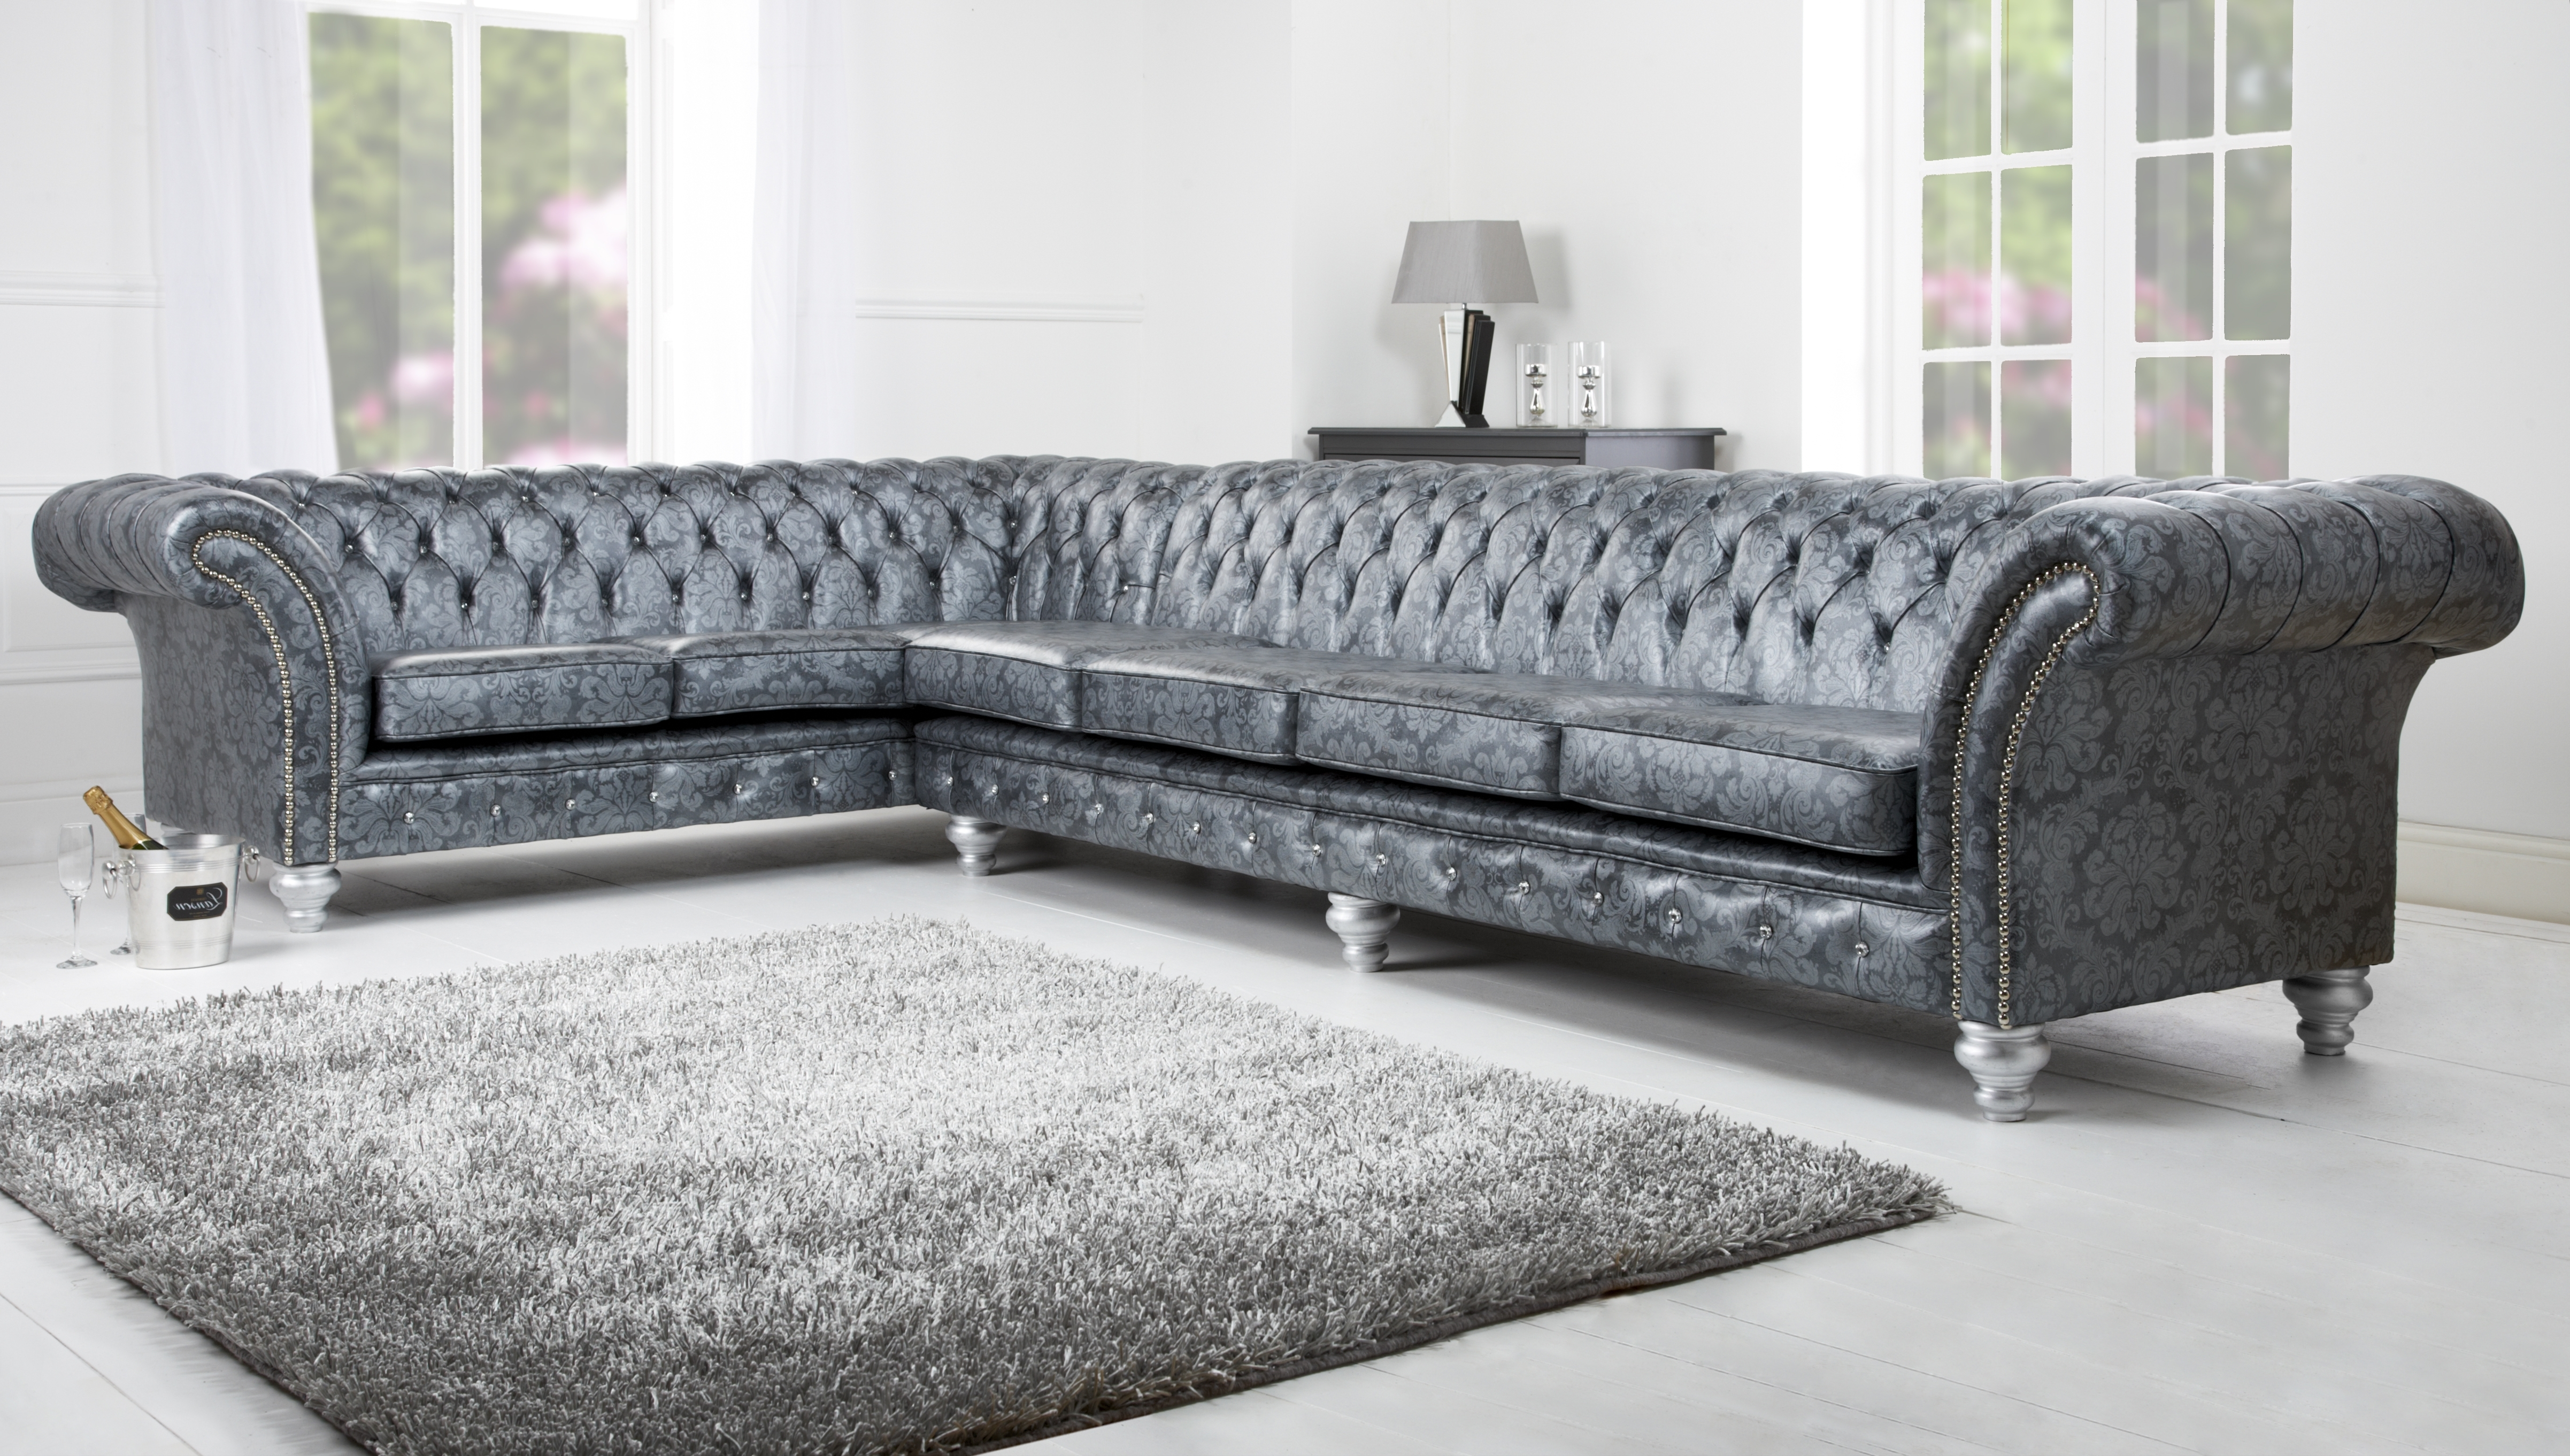 Corner Sofa – English Chesterfields With Regard To Favorite Corner Sofa Chairs (View 11 of 15)